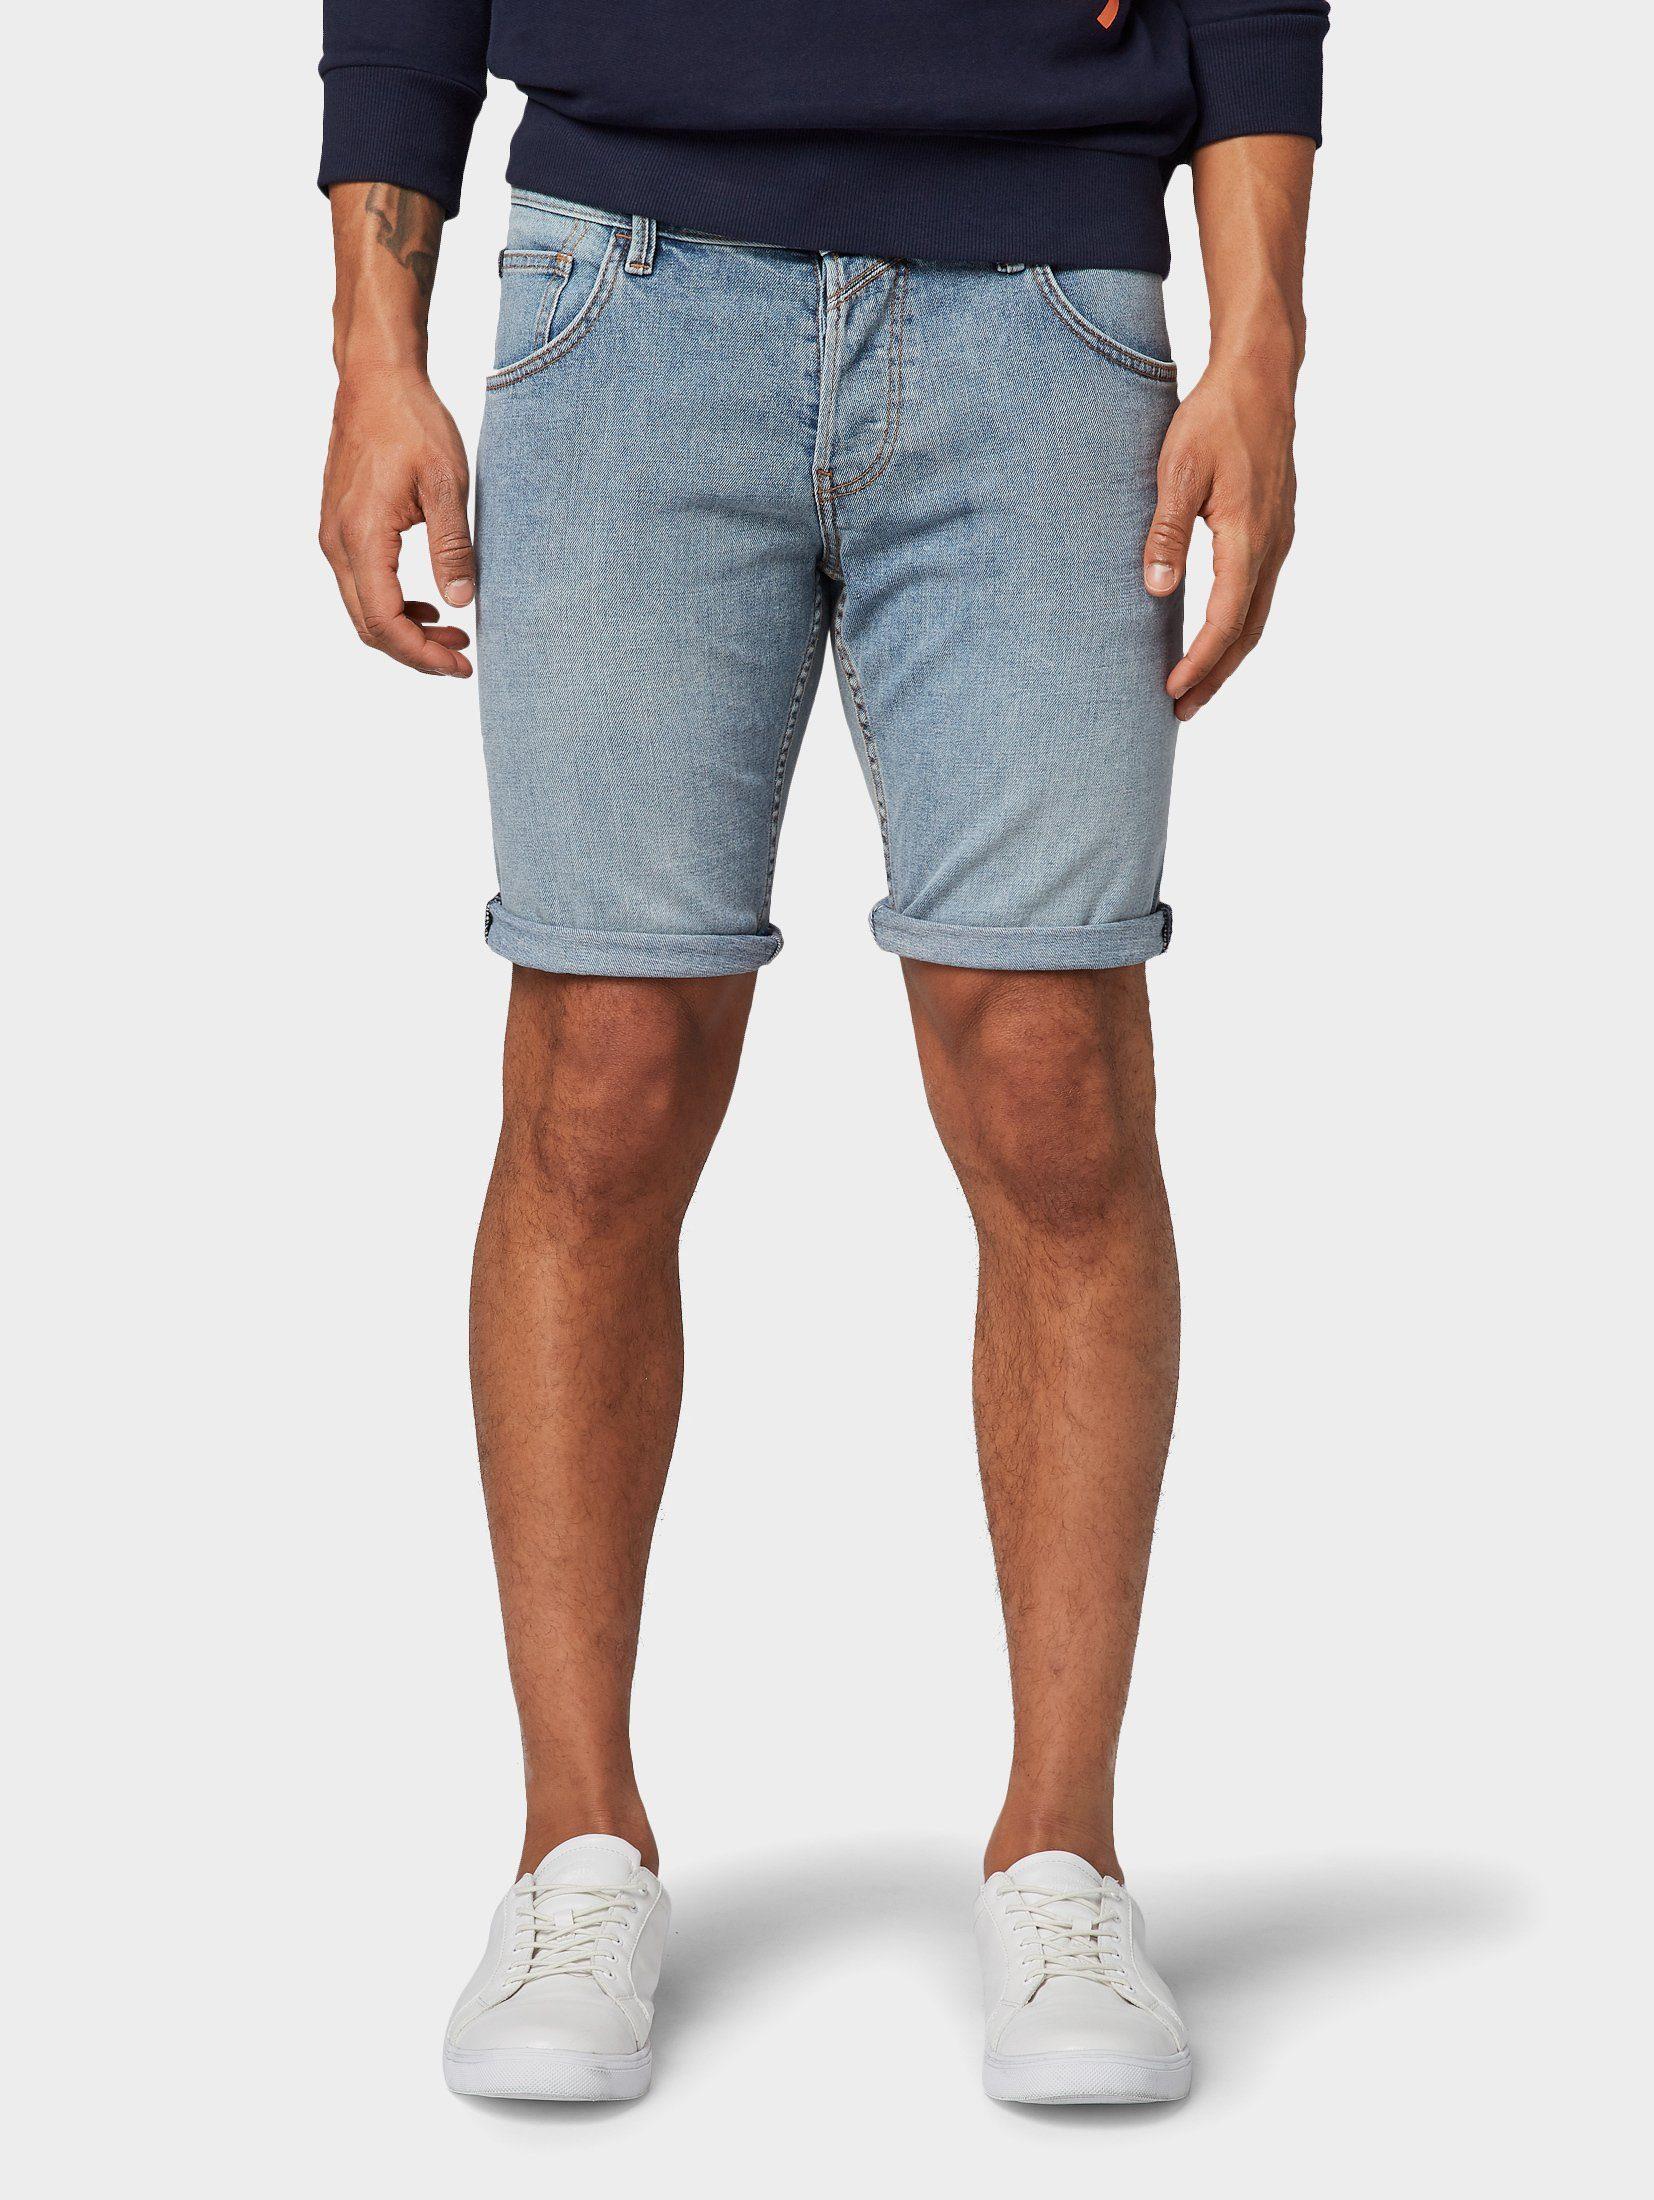 TOM TAILOR Denim Jeansshorts Jeans Shorts | Bekleidung > Shorts & Bermudas > Shorts | Tom Tailor Denim